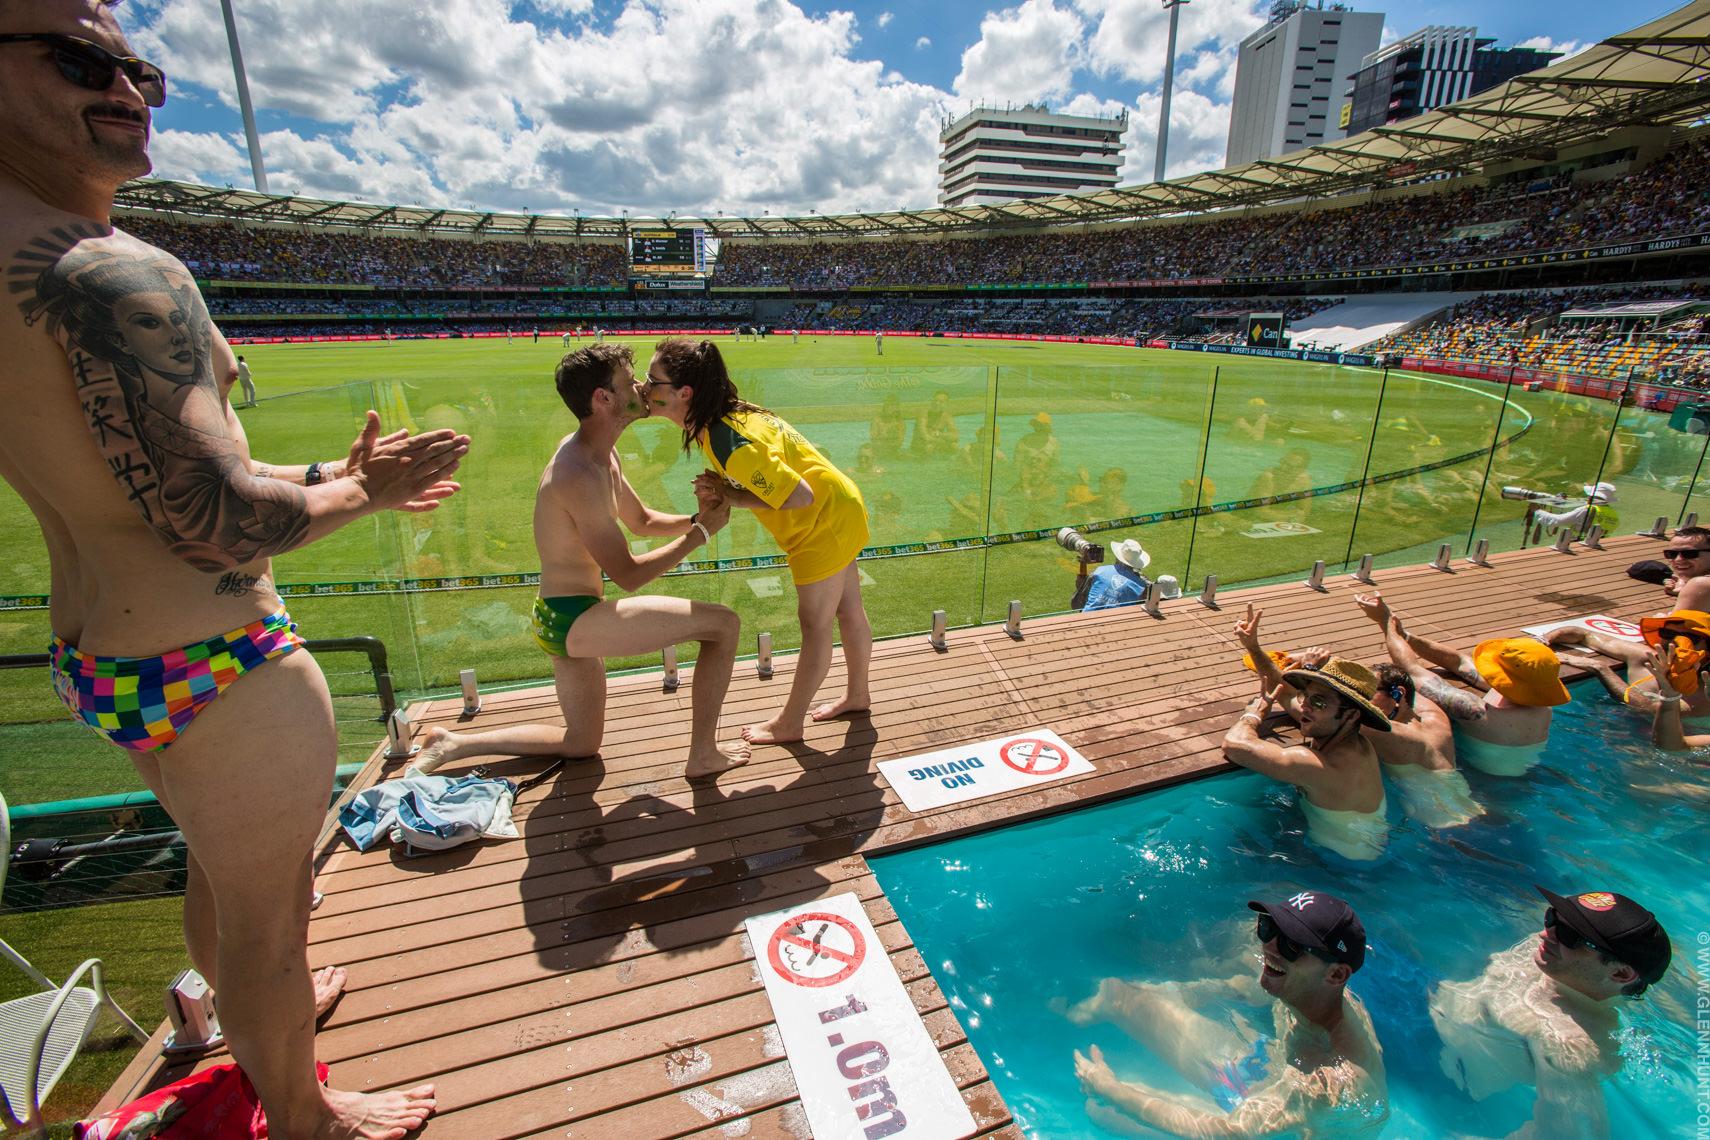 Proposal at the Cricket